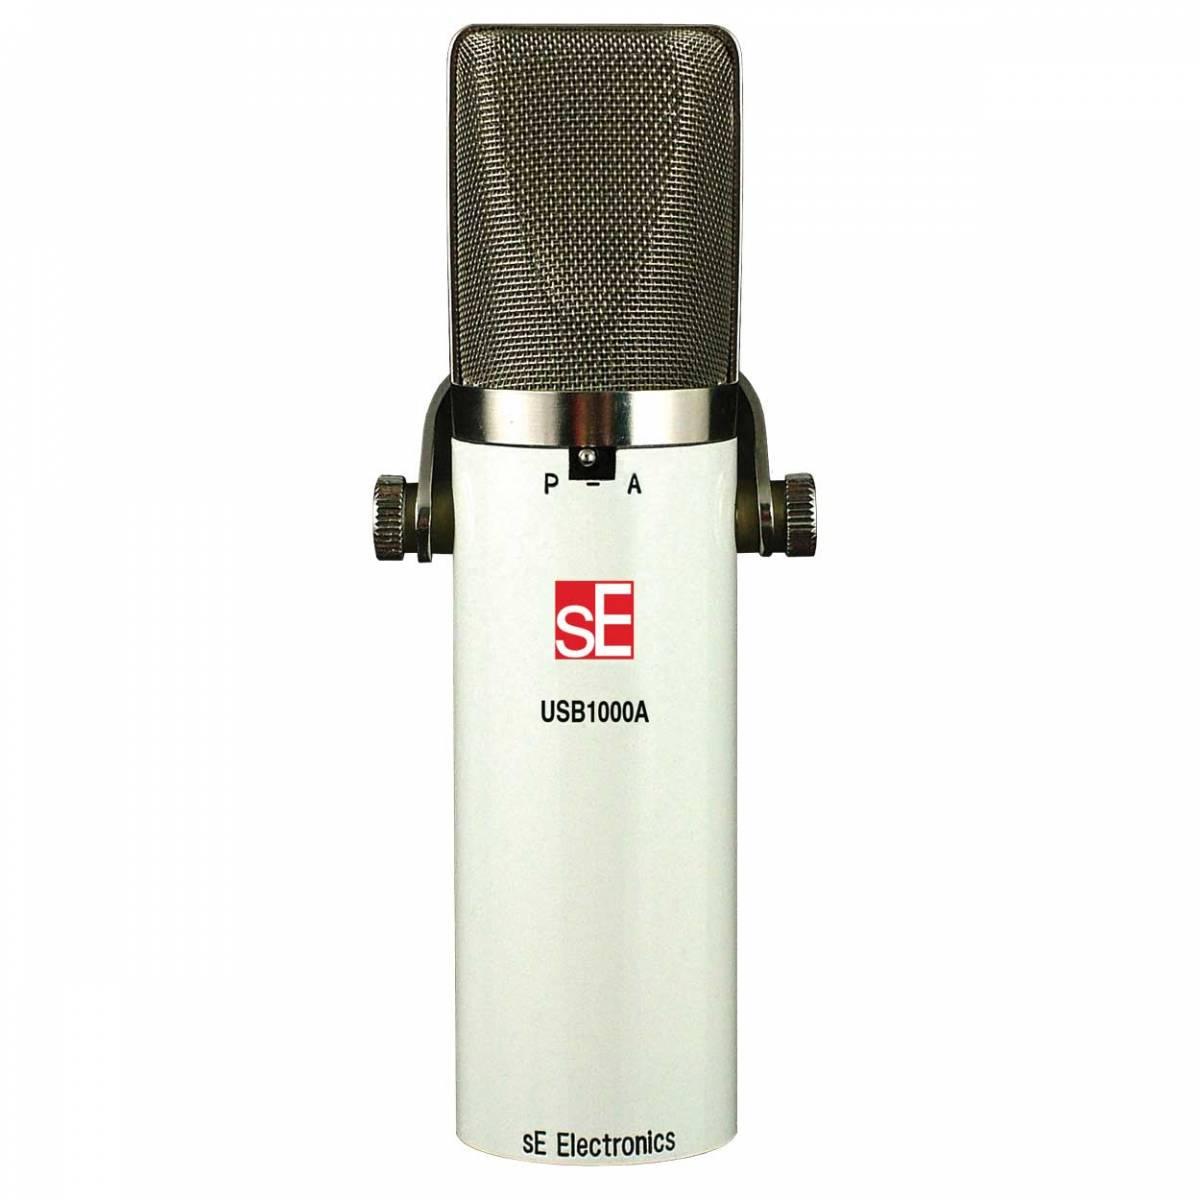 se electronics usb1000a usb condenser microphone usb microphones from inta audio uk. Black Bedroom Furniture Sets. Home Design Ideas